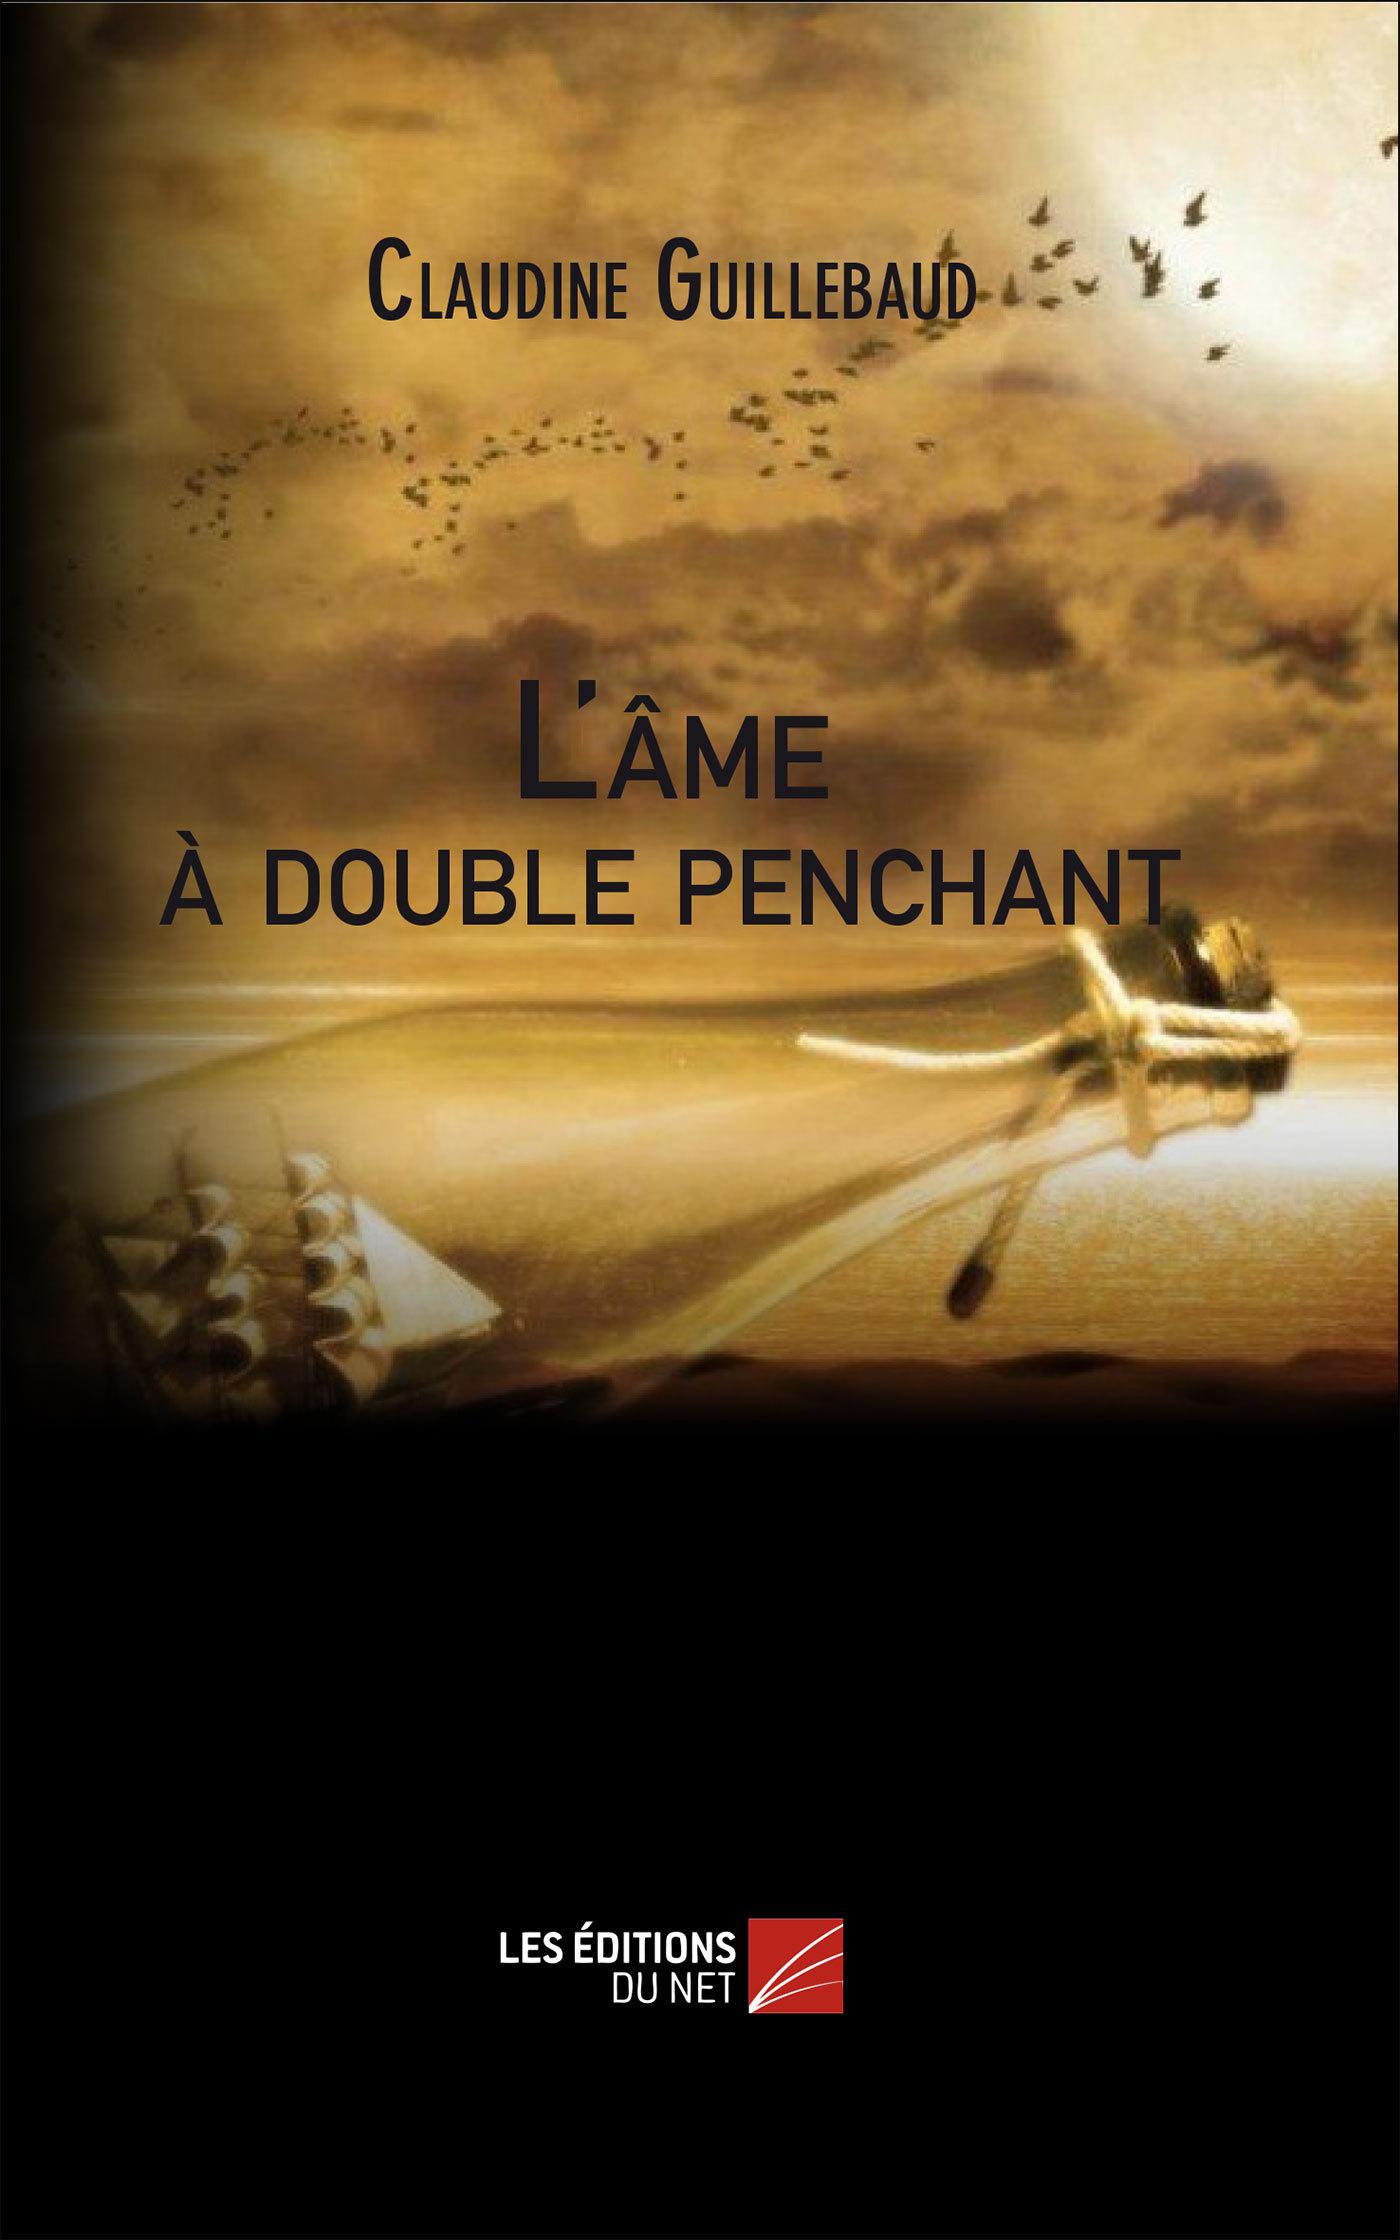 L'AME A DOUBLE PENCHANT